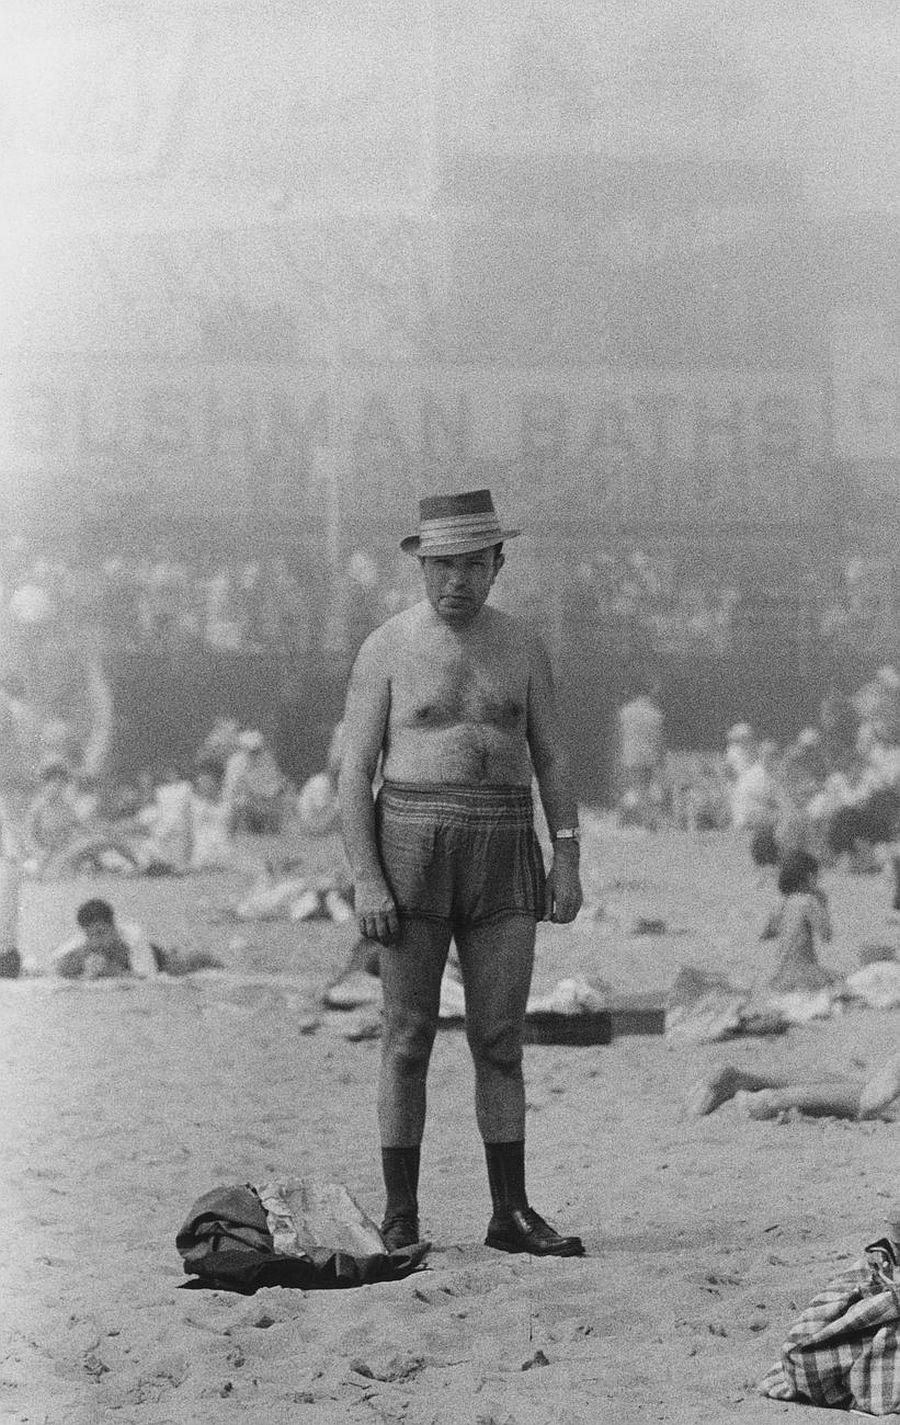 Diane Arbus, Man in hat, trunks, socks and shoes, Coney Island, N.Y. , 1960